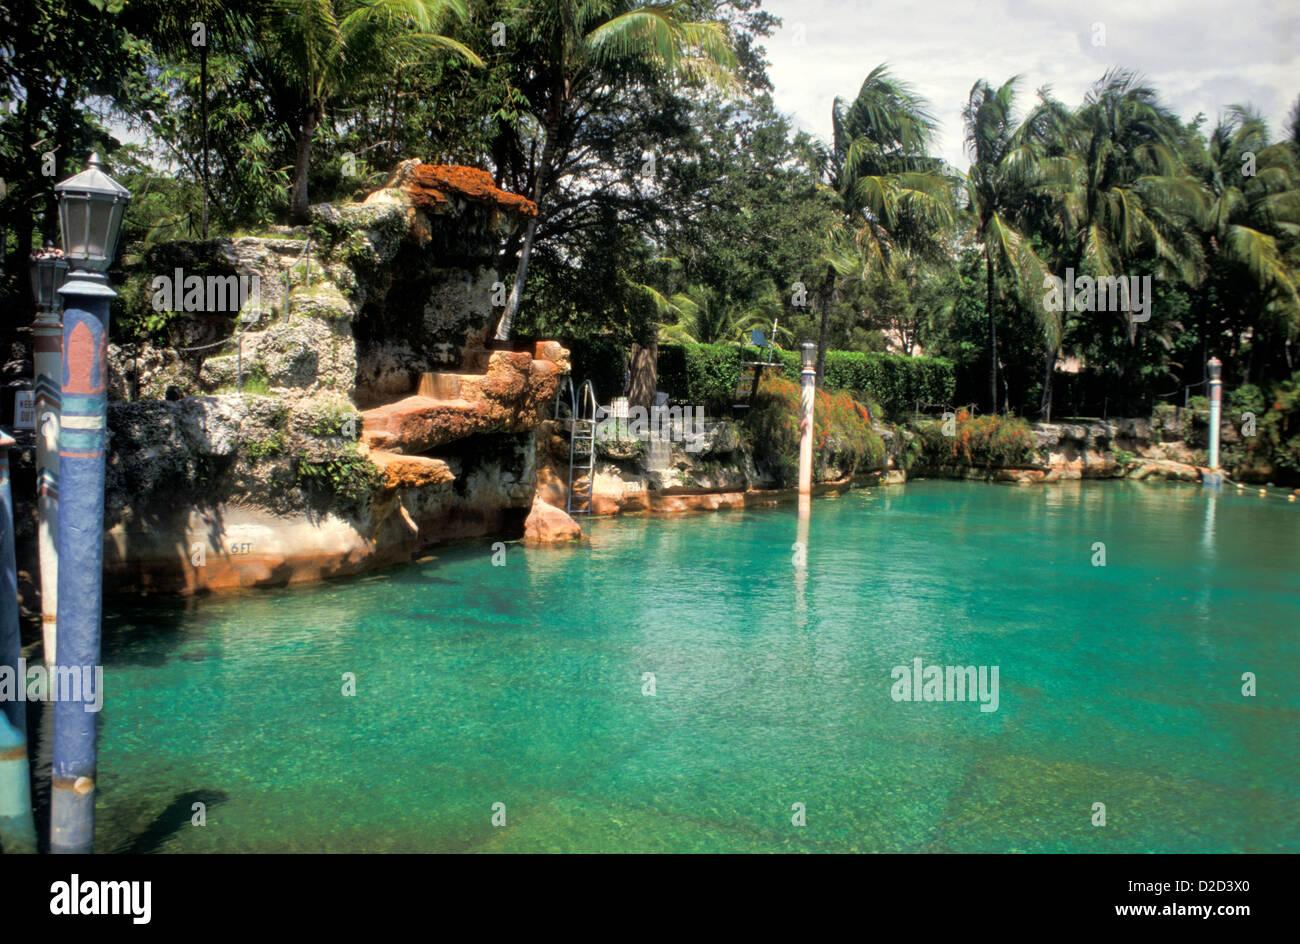 Florida. Cofloridaral Gables. Venetian Pool - Stock Image